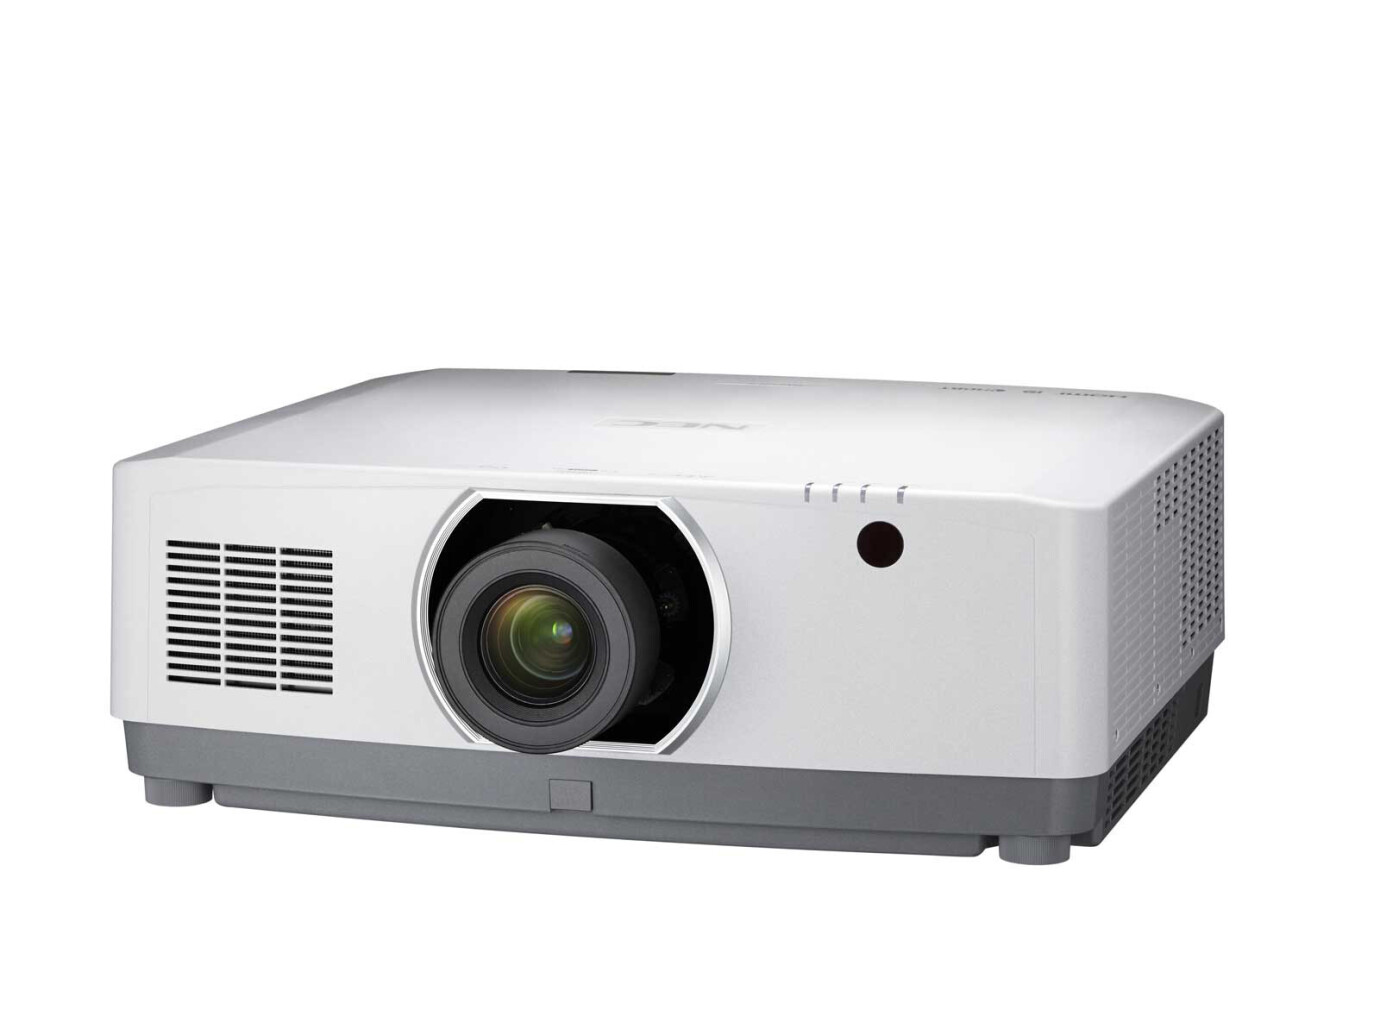 NEC PA703UL (incl. Lens)